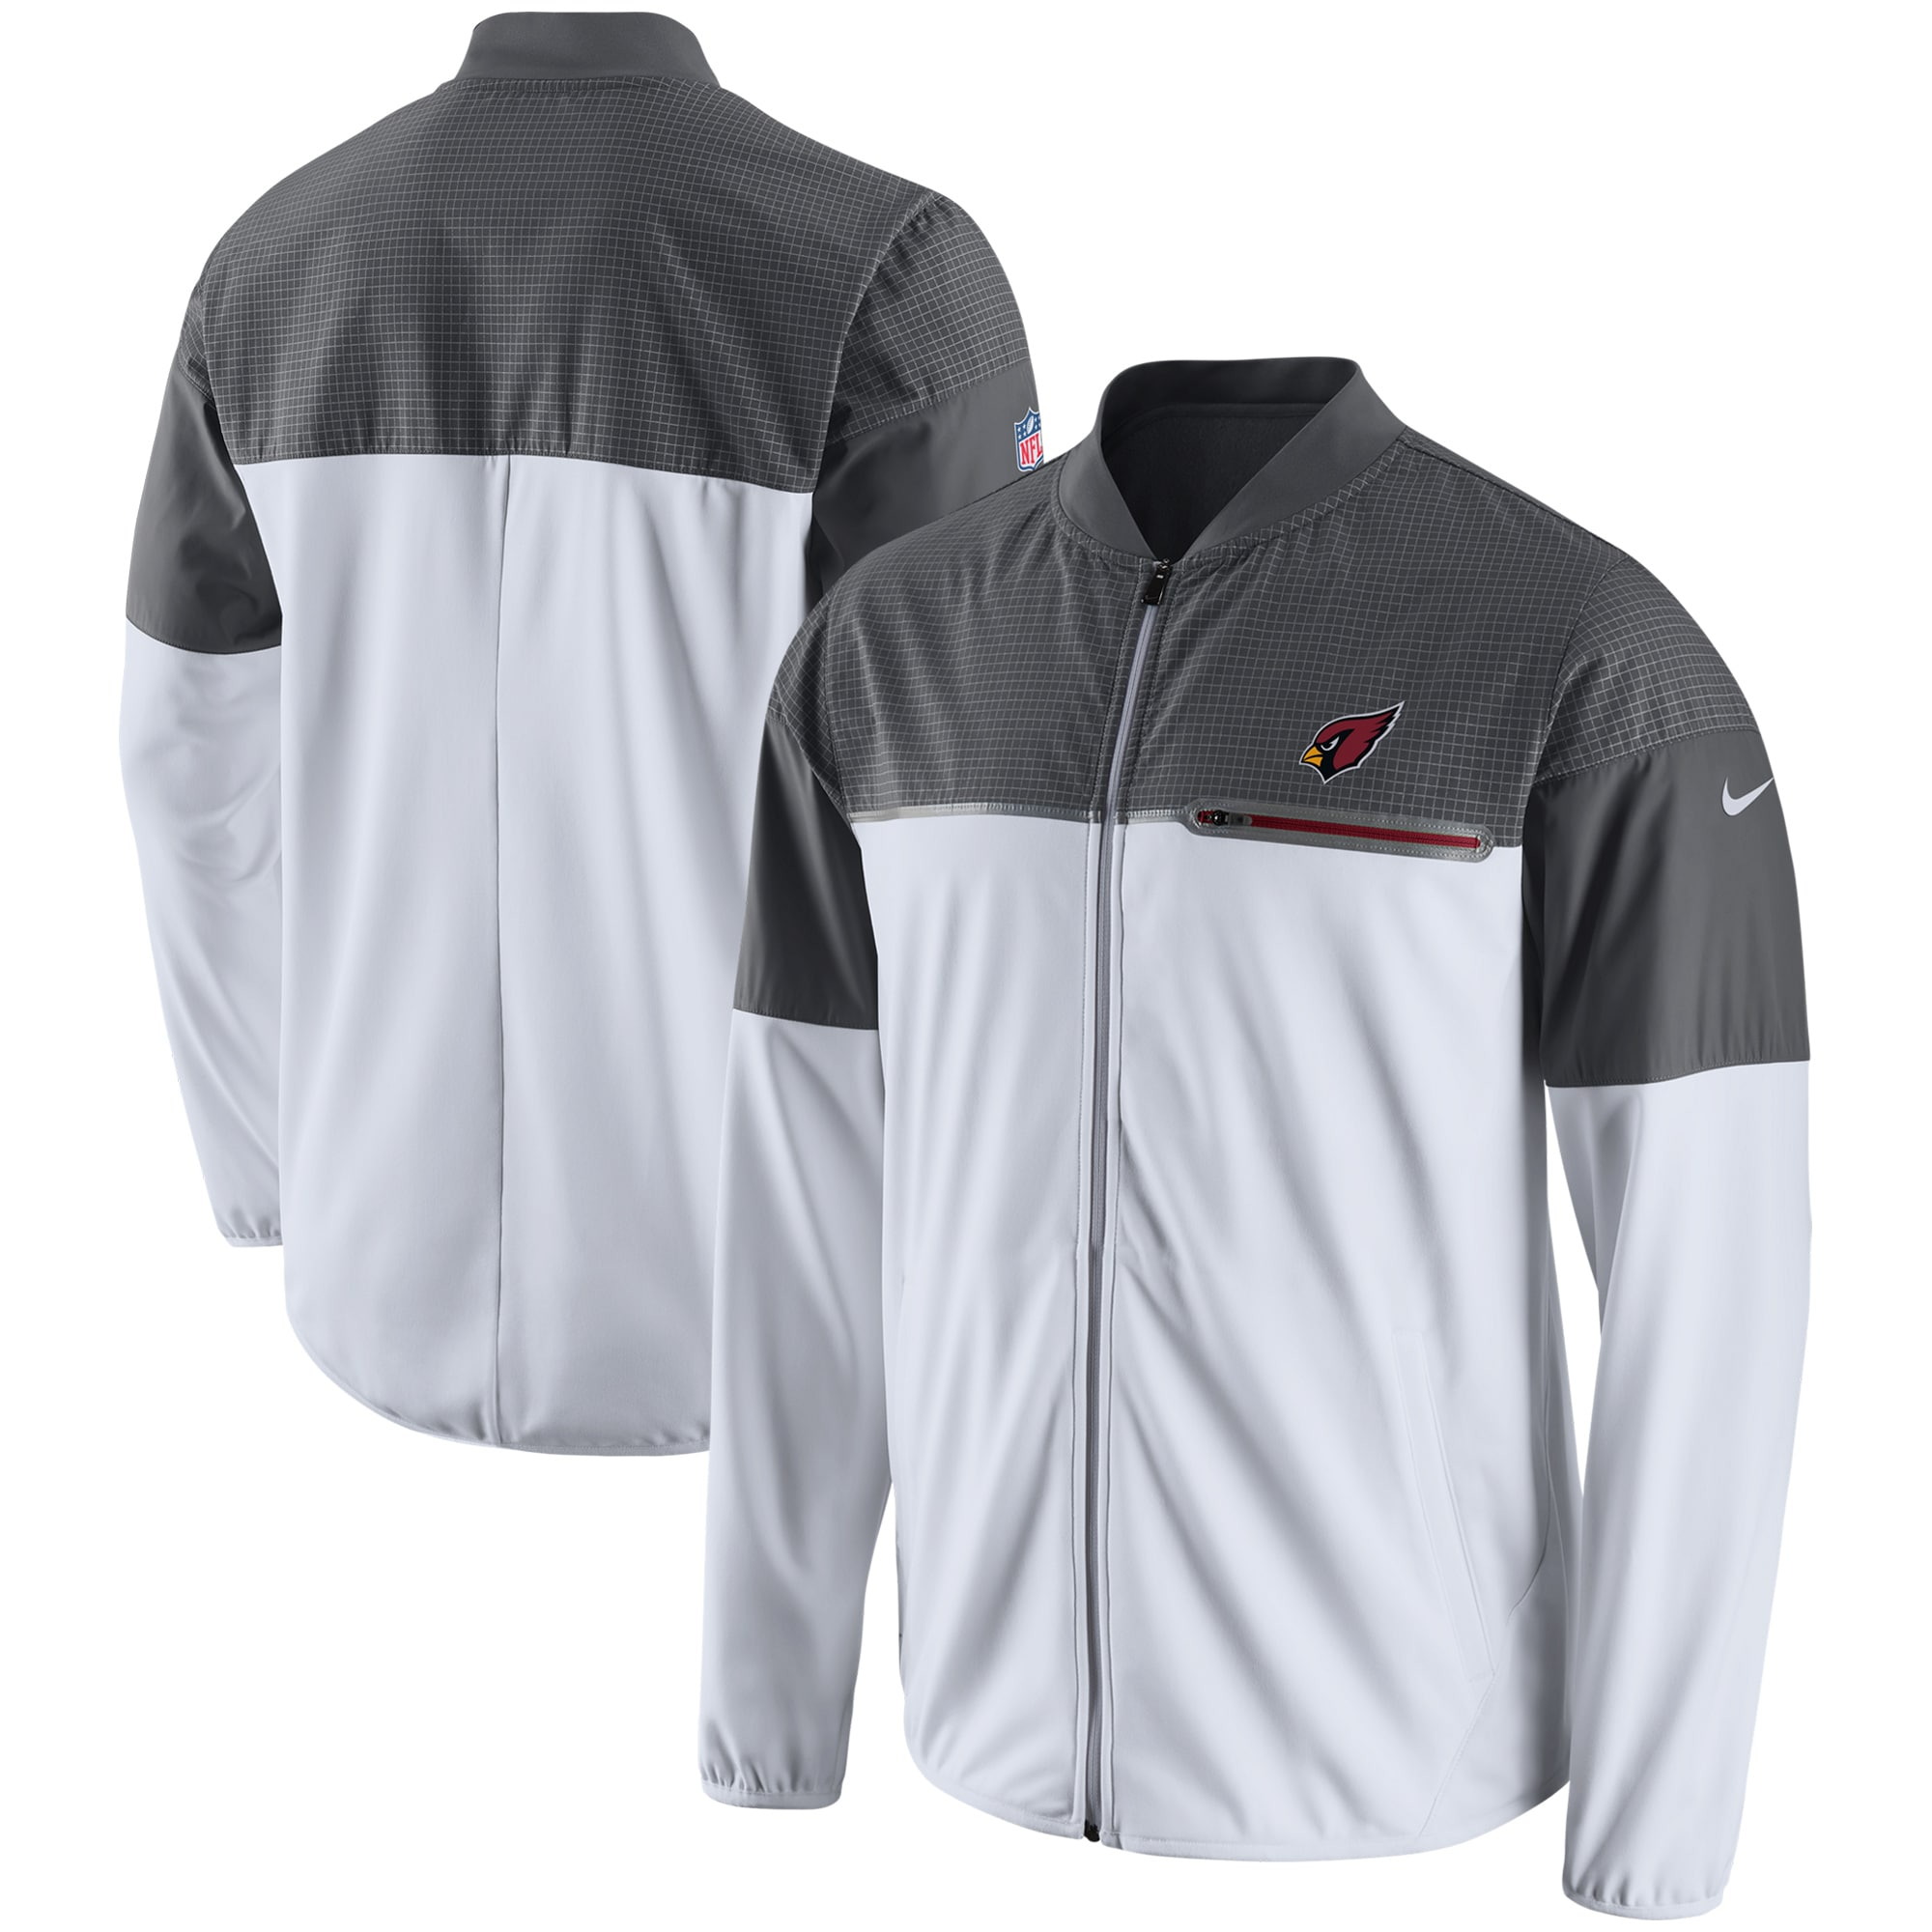 Arizona Cardinals Nike Champ Drive Flash Hybrid Full-Zip Jacket - White/Gray